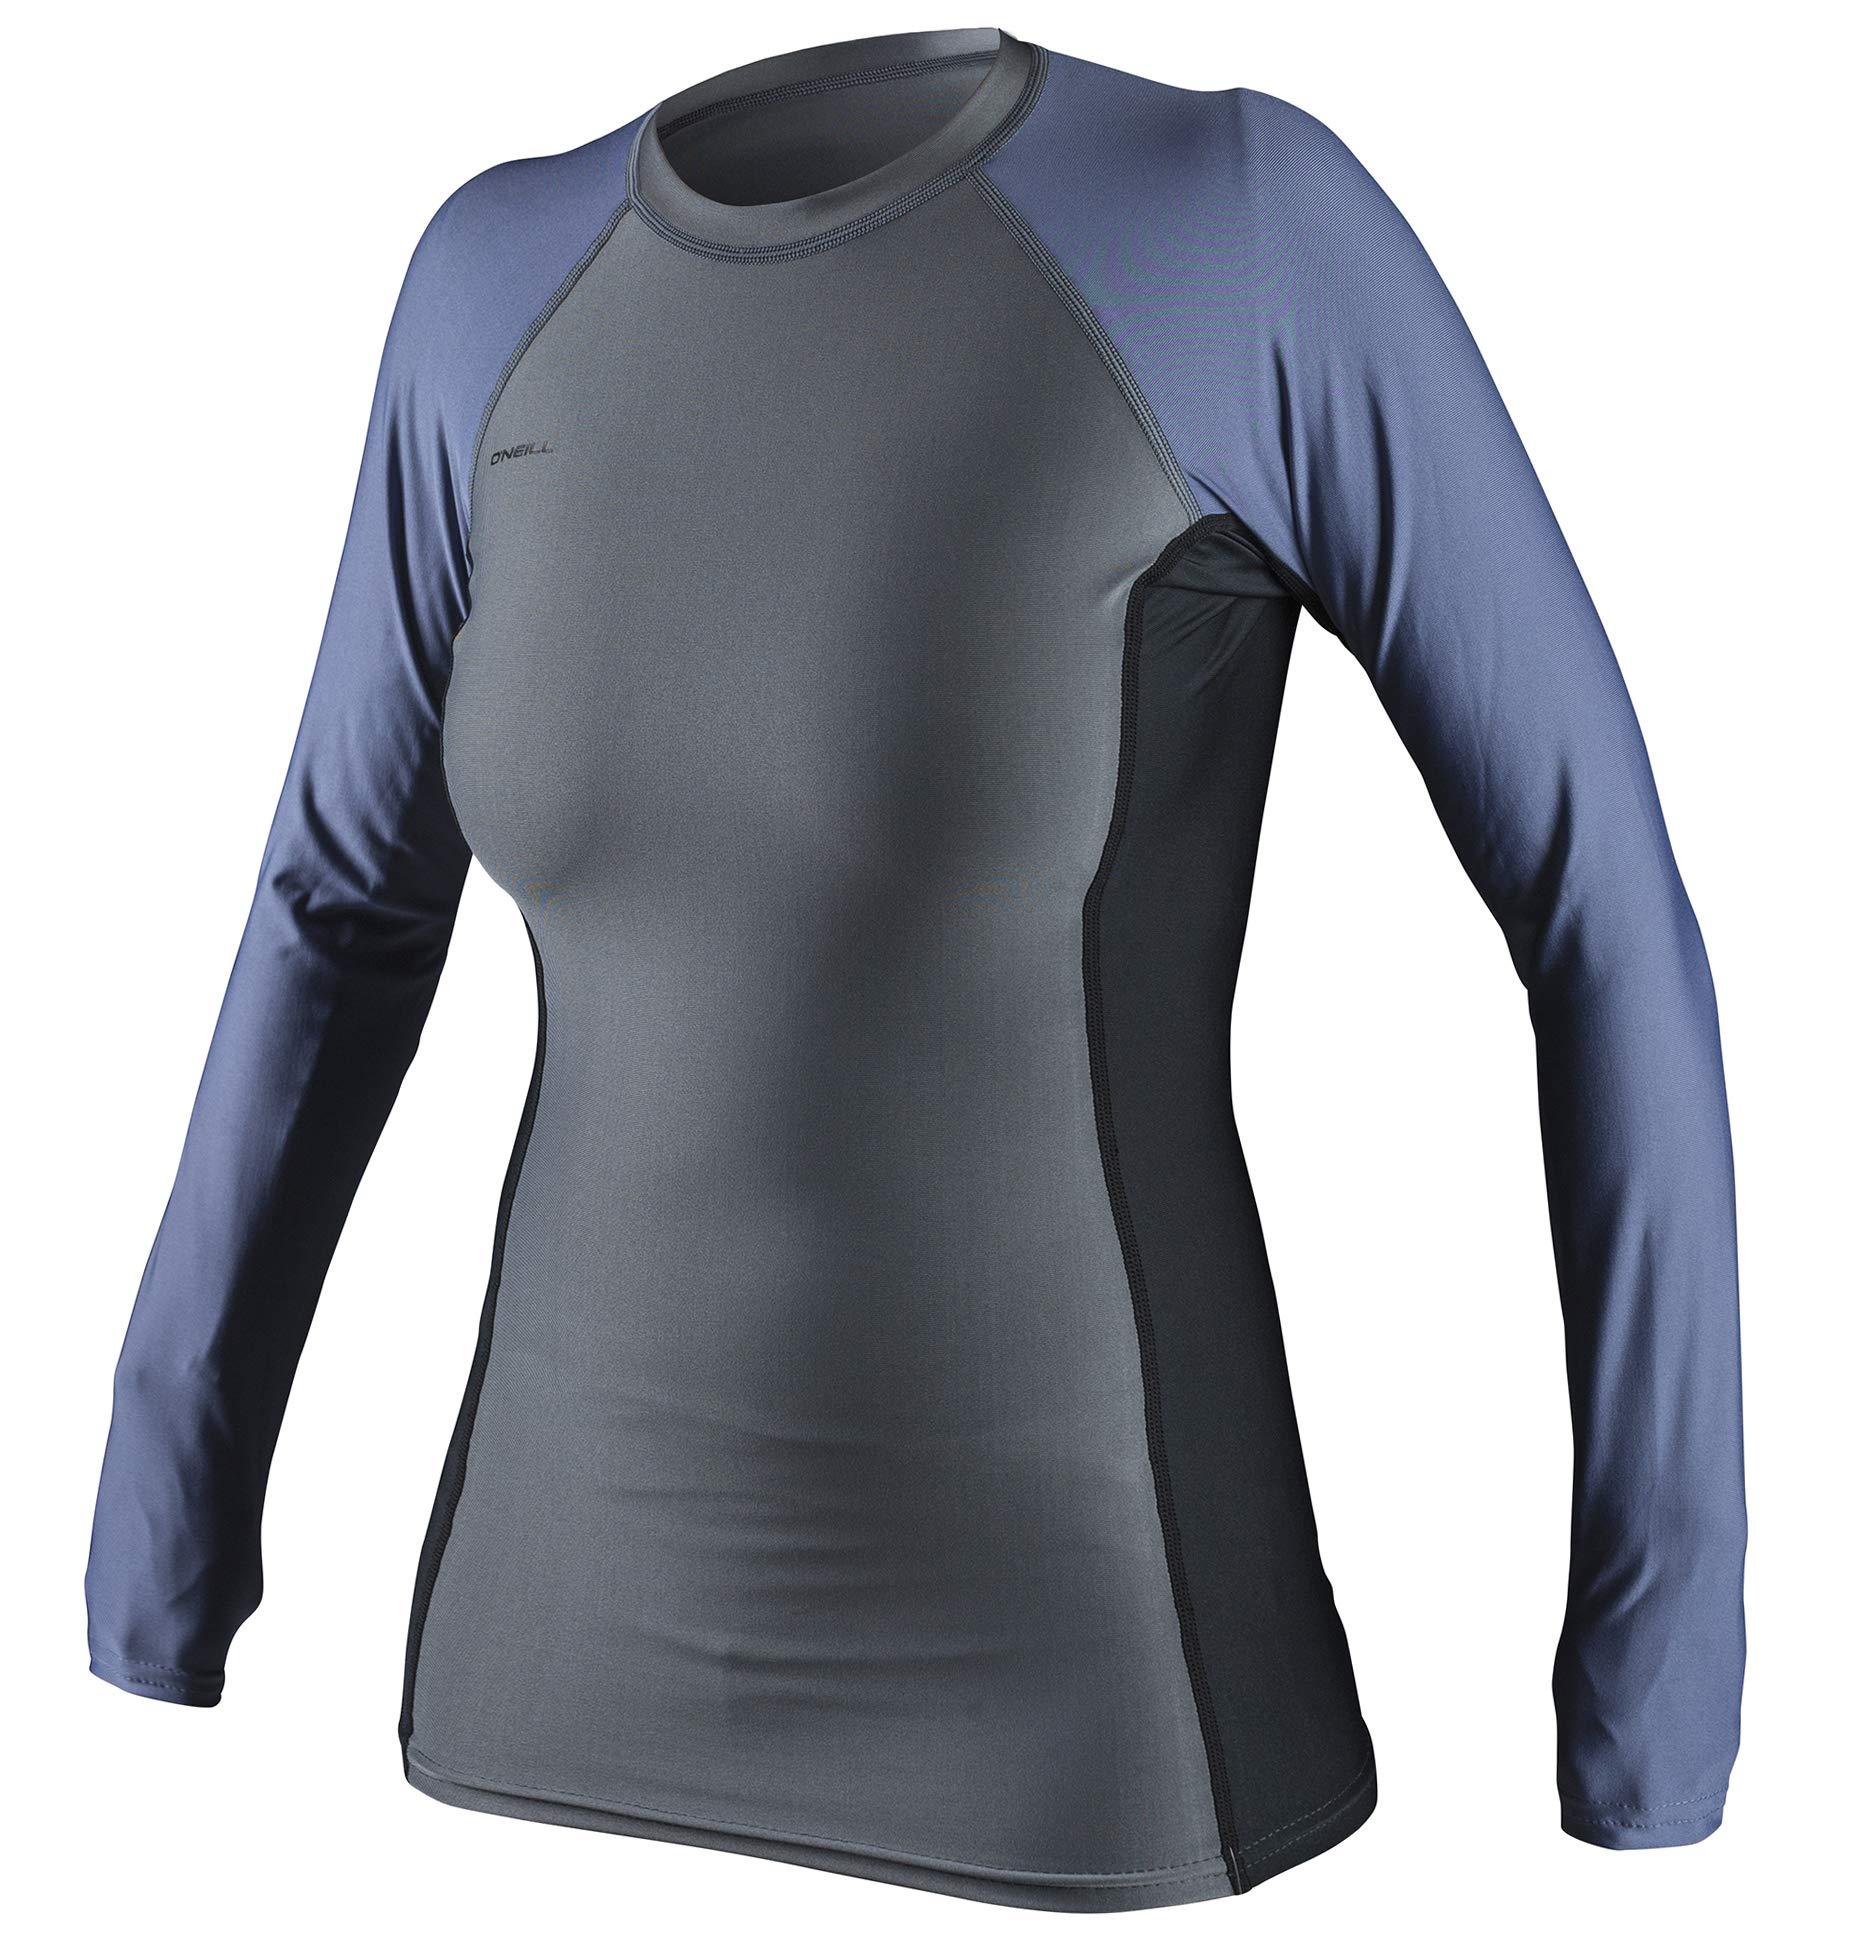 O'Neill Oneill Womens Basic Long Sleeve Rash Guard - Smoke BLK Mist - Smoke Black Mist, X-Small